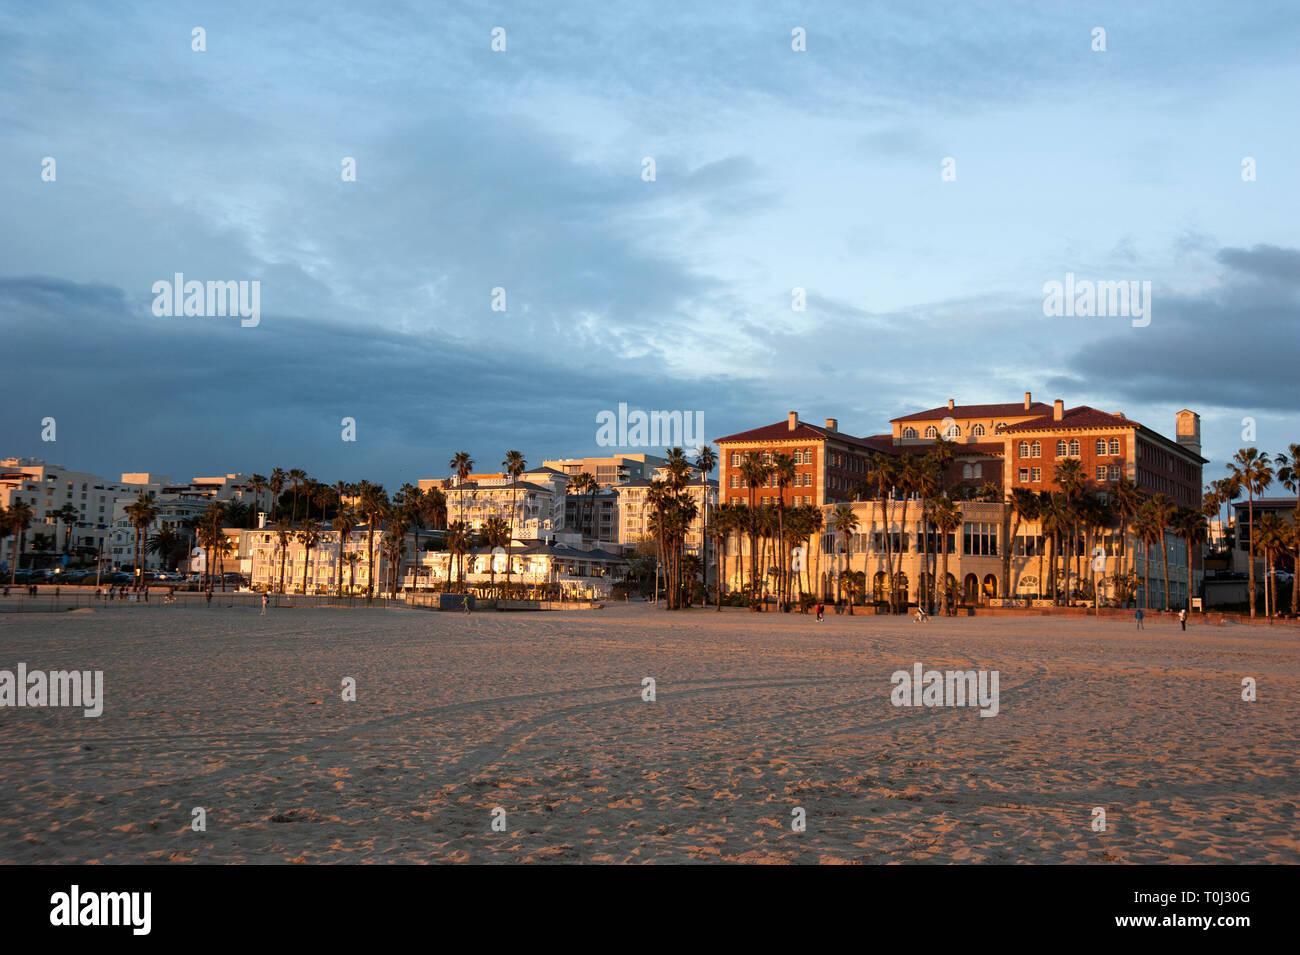 Beachfront hotels Shutters and Casa Del Mar along the boardwalk in Santa Monica, CA Stock Photo